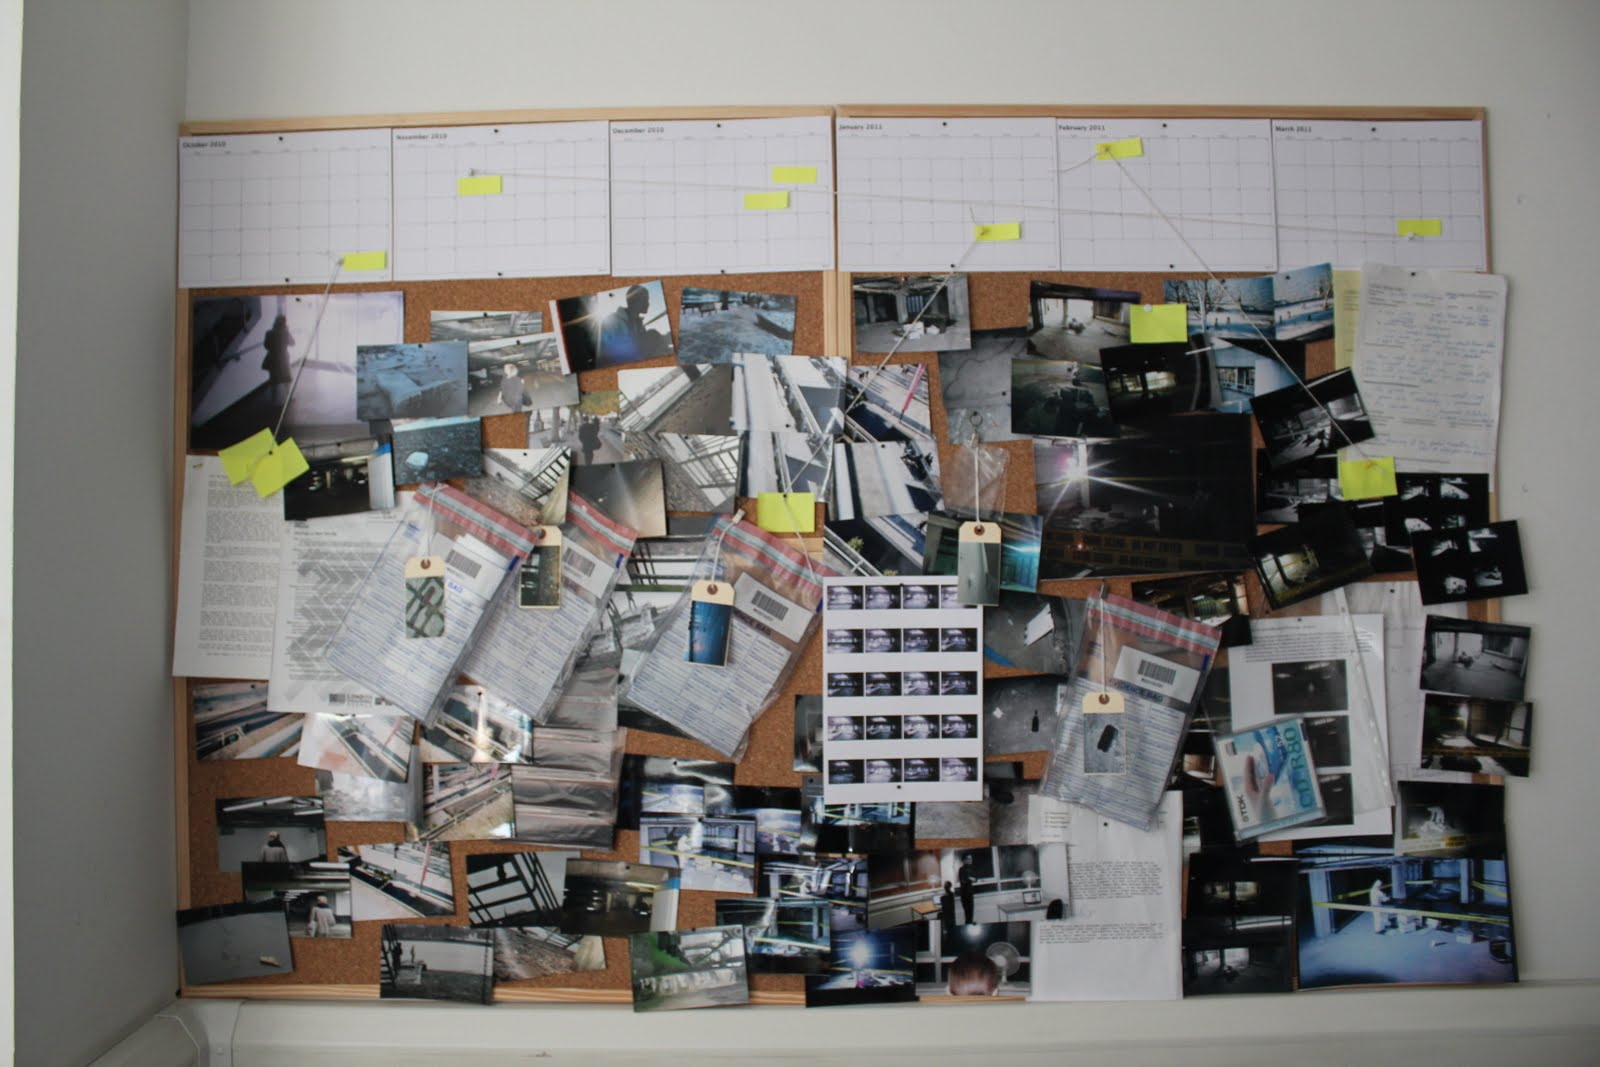 Surveillance >> Surveillance: Mosaic Investigation Wall